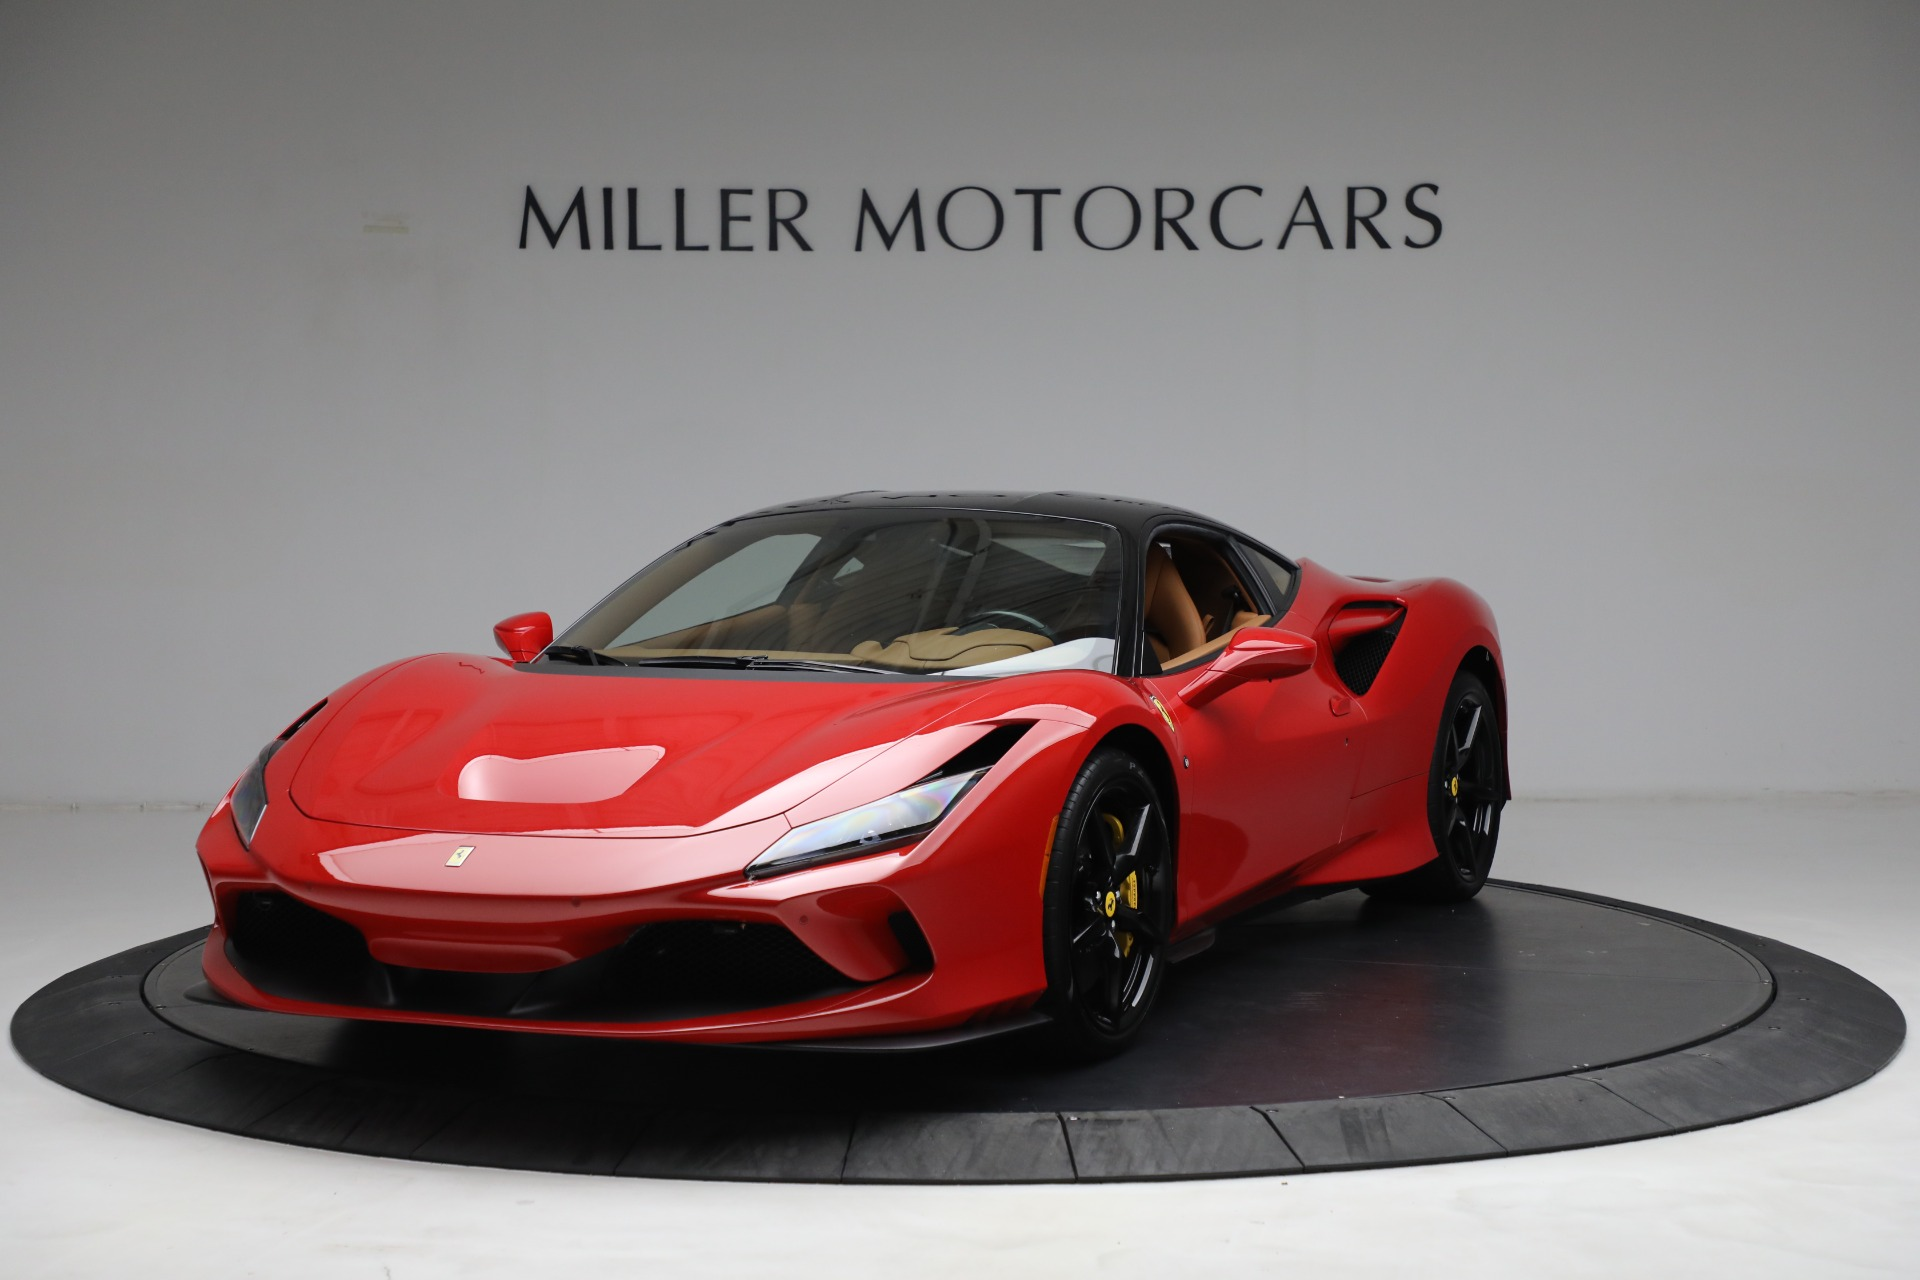 Used 2021 Ferrari F8 Tributo for sale Call for price at Maserati of Westport in Westport CT 06880 1